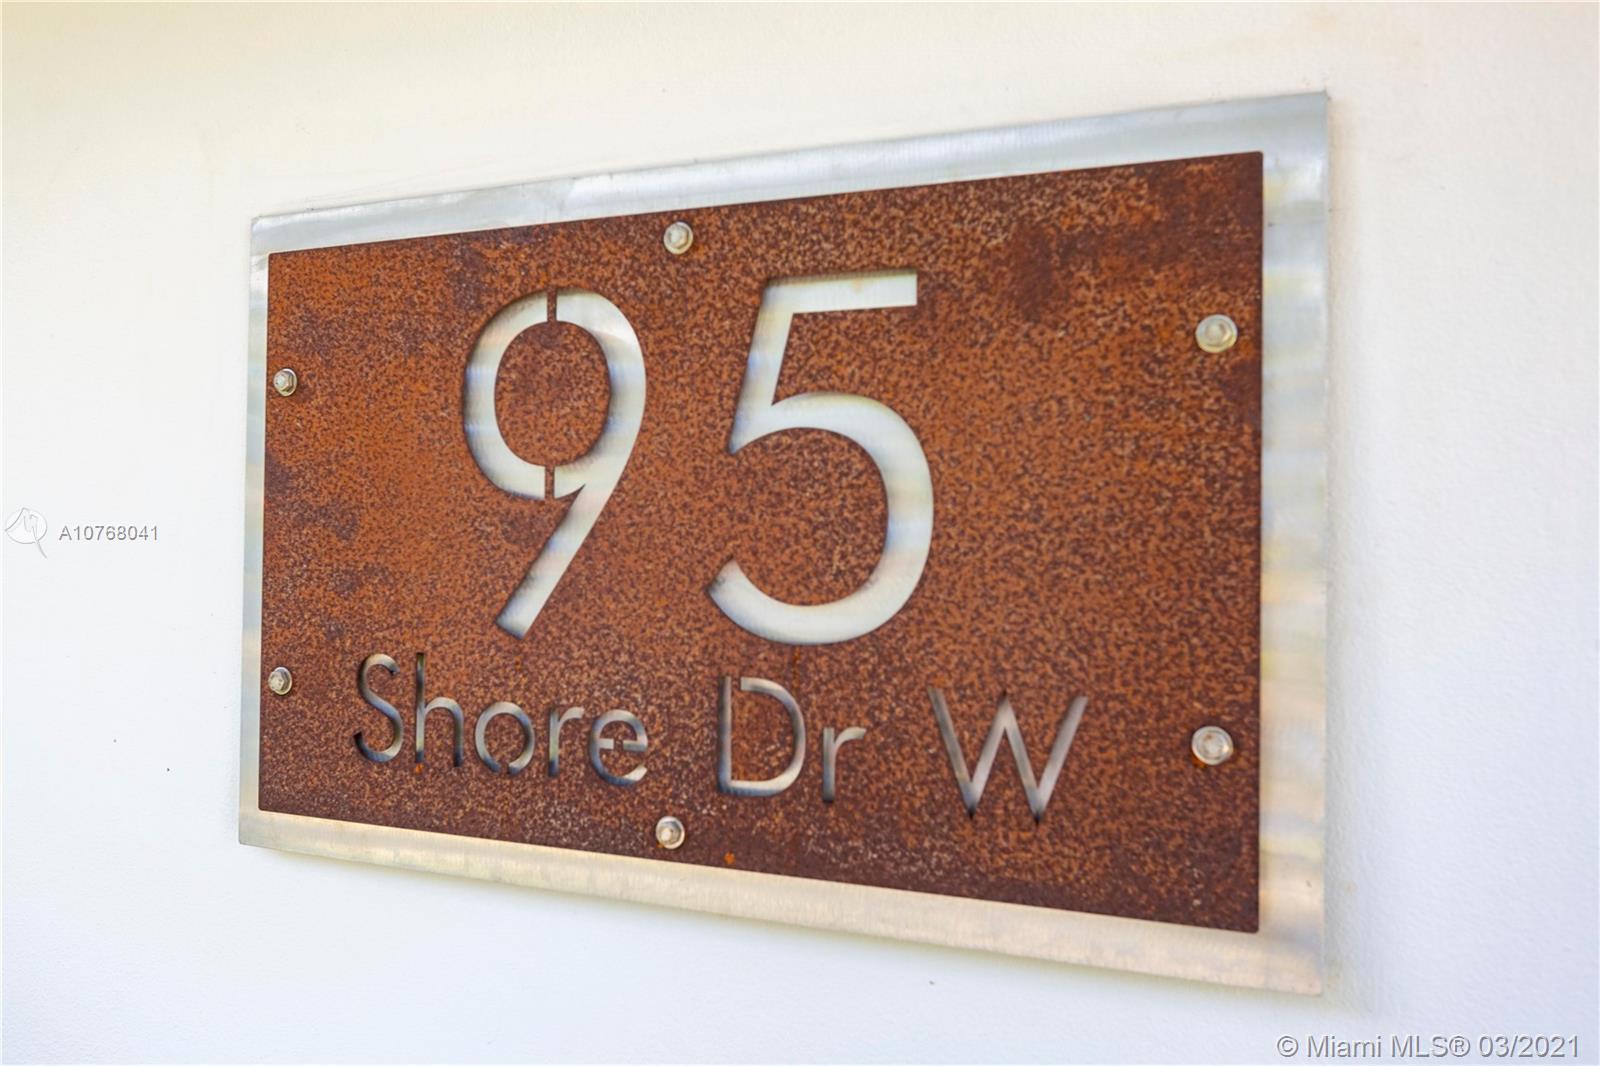 95 W Shore Dr W, Miami, Florida 33133, 6 Bedrooms Bedrooms, ,5 BathroomsBathrooms,Residential,For Sale,95 W Shore Dr W,A10768041